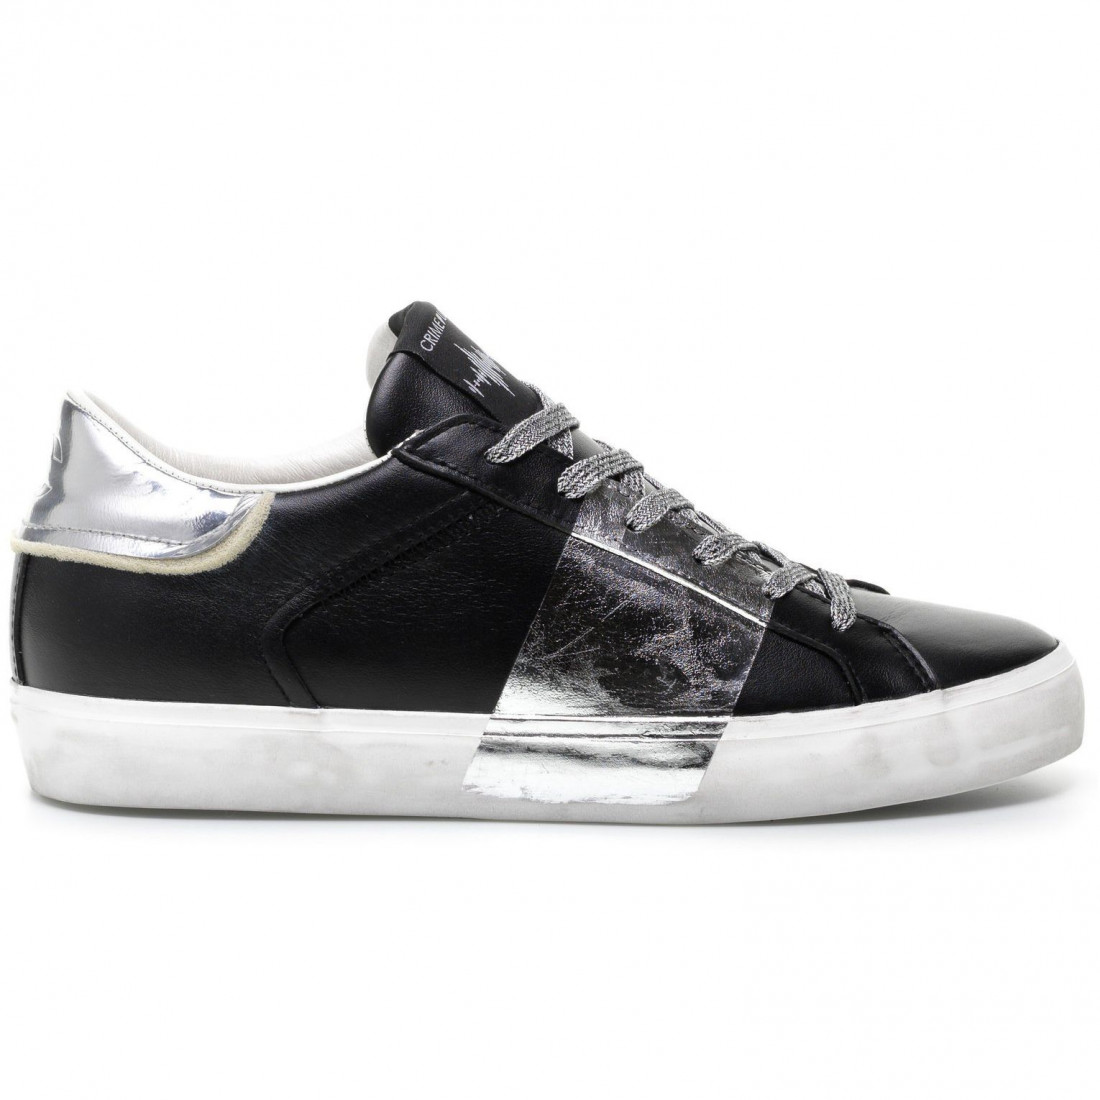 sneakers woman crime london 2500620 black 7839